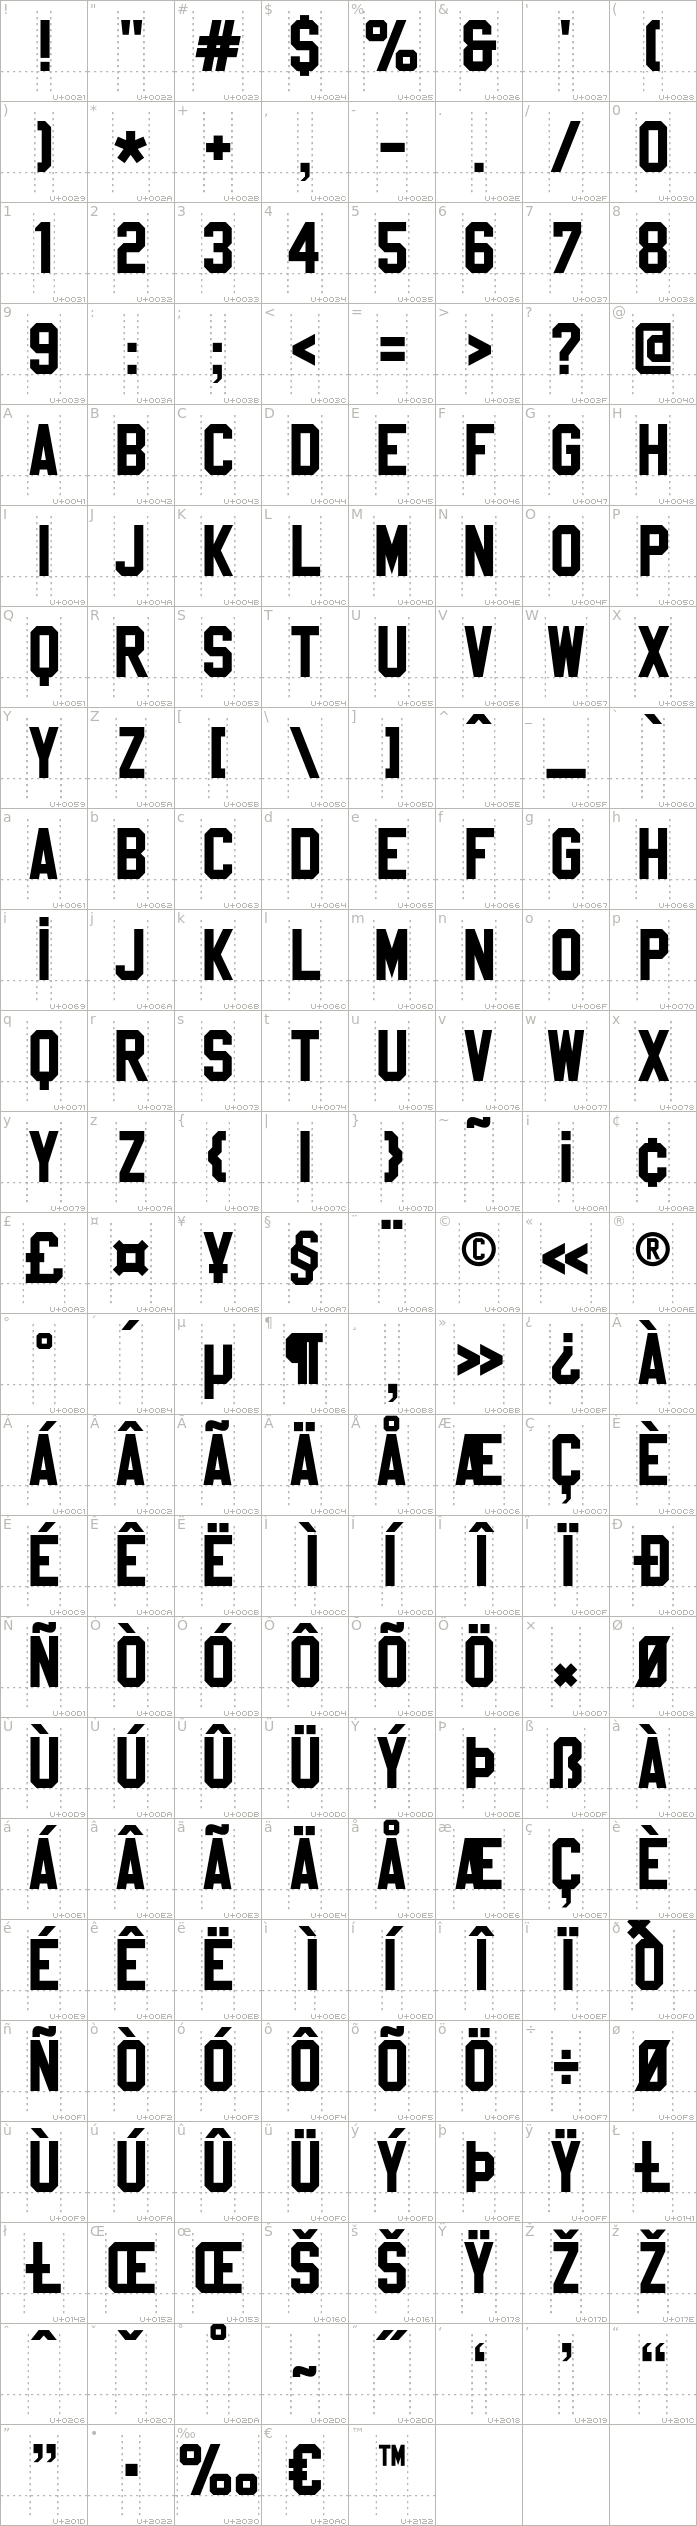 sablon-up.regular.character-map-1